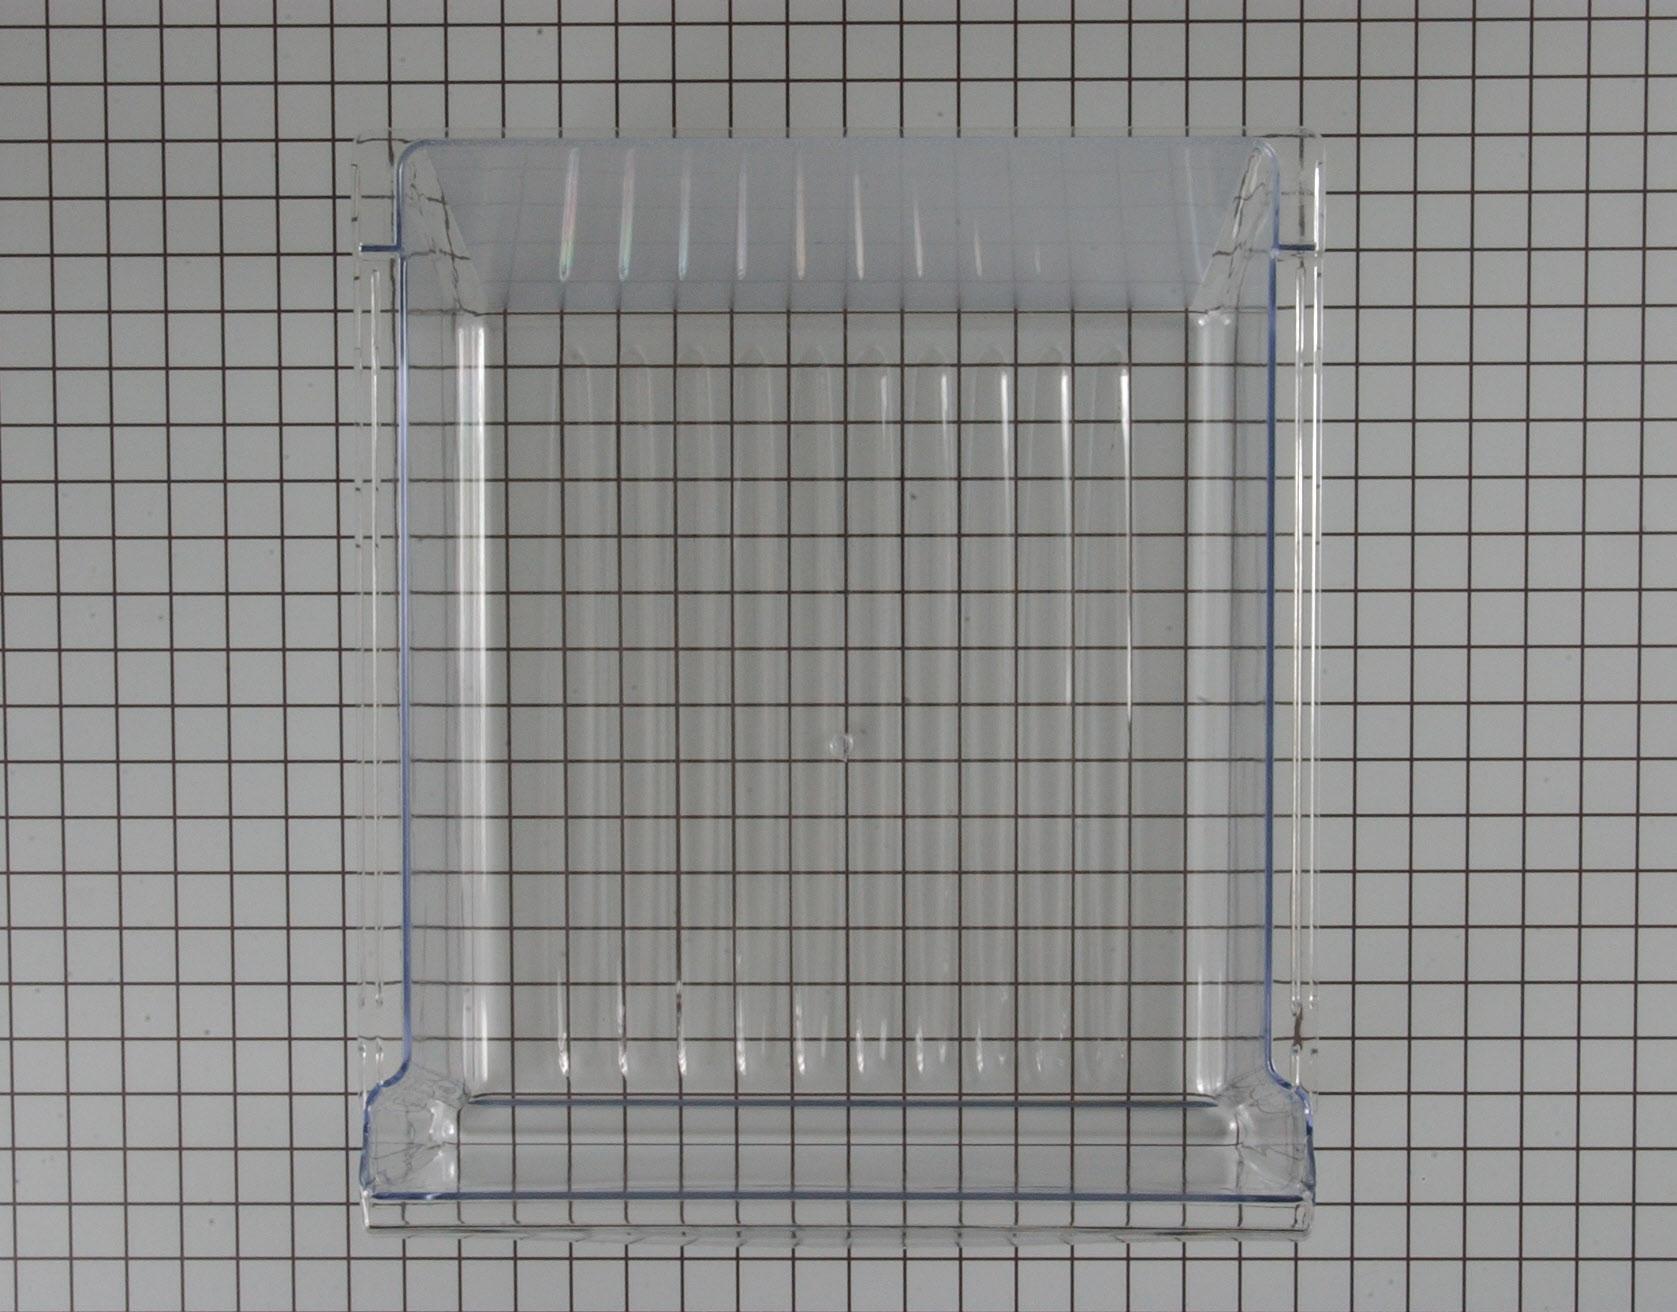 WP67004515 Ikea Refrigerator Part -Crisper Drawer